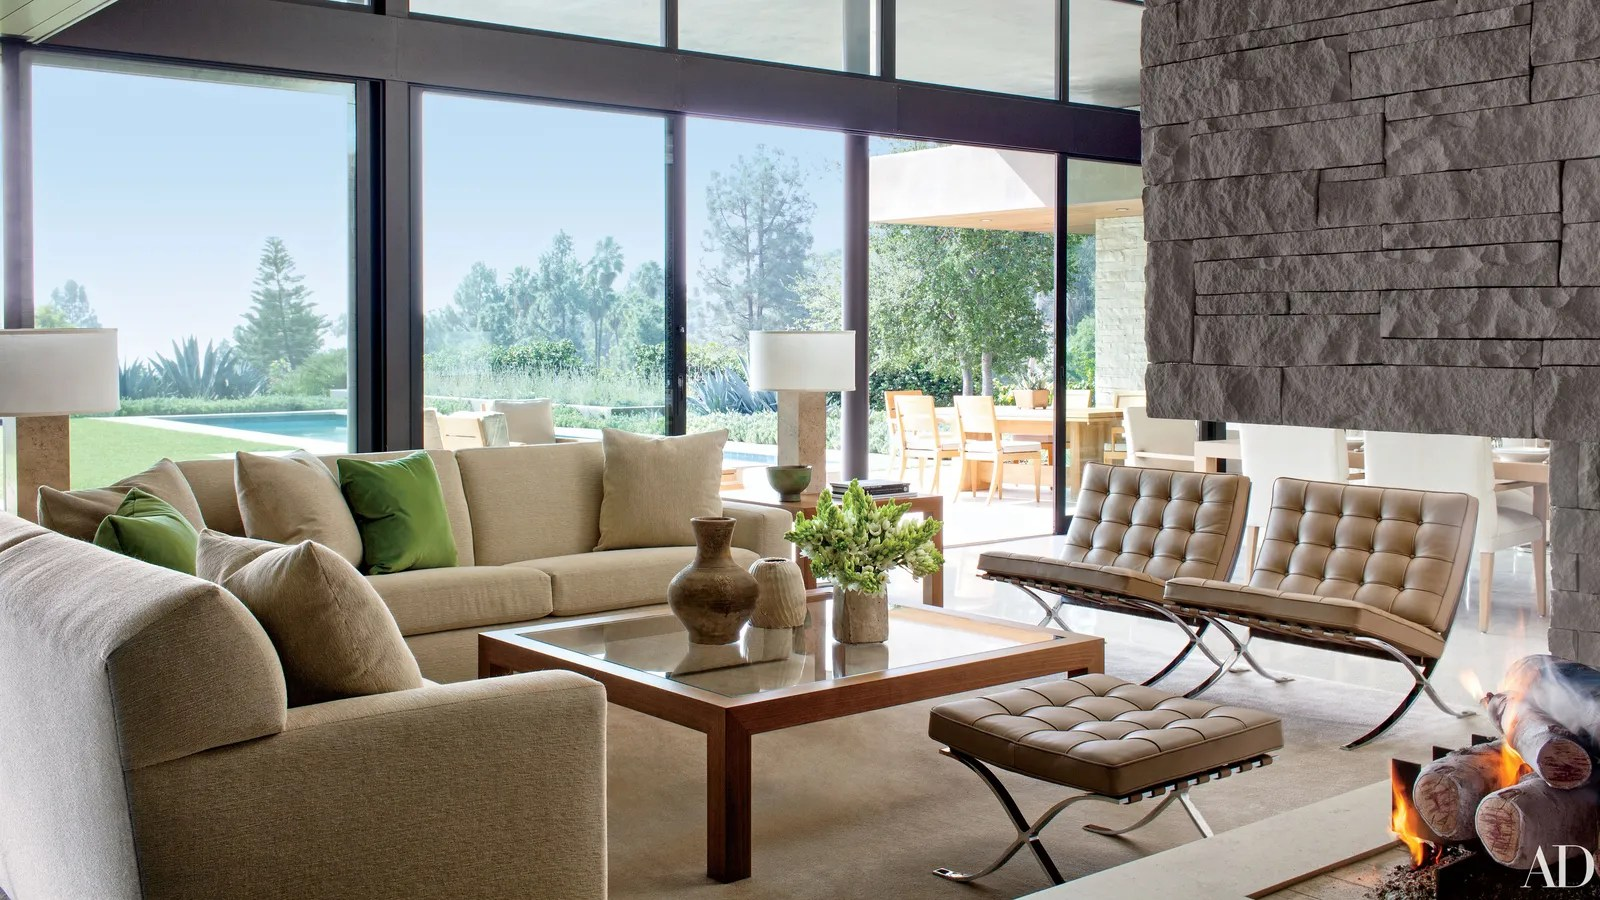 18 Stylish Homes With Modern Interior Design